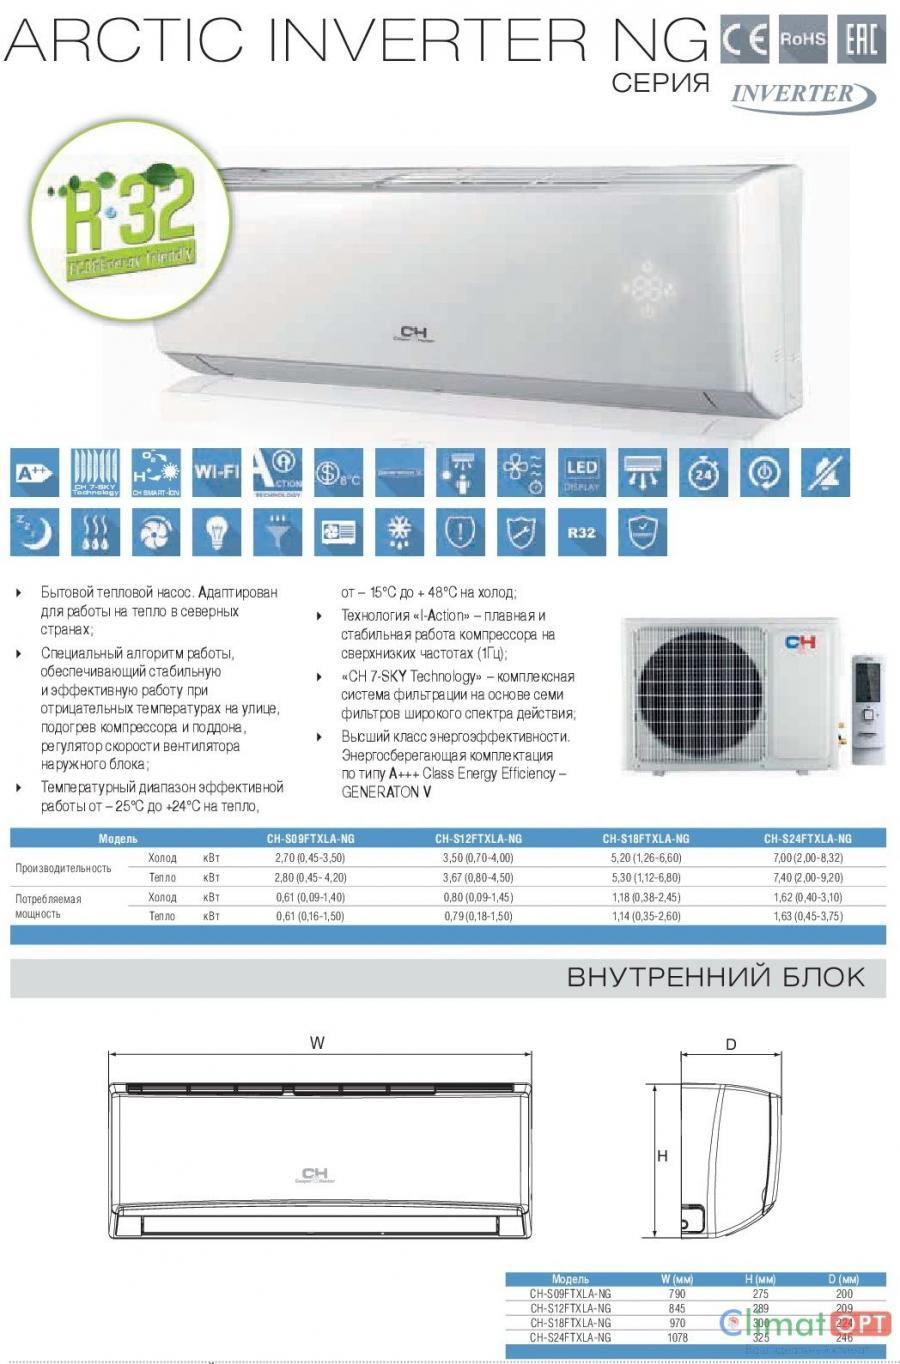 Cooper&Hunter Arctic WIFI Inverter R32 New 2018 (Акция на установку)